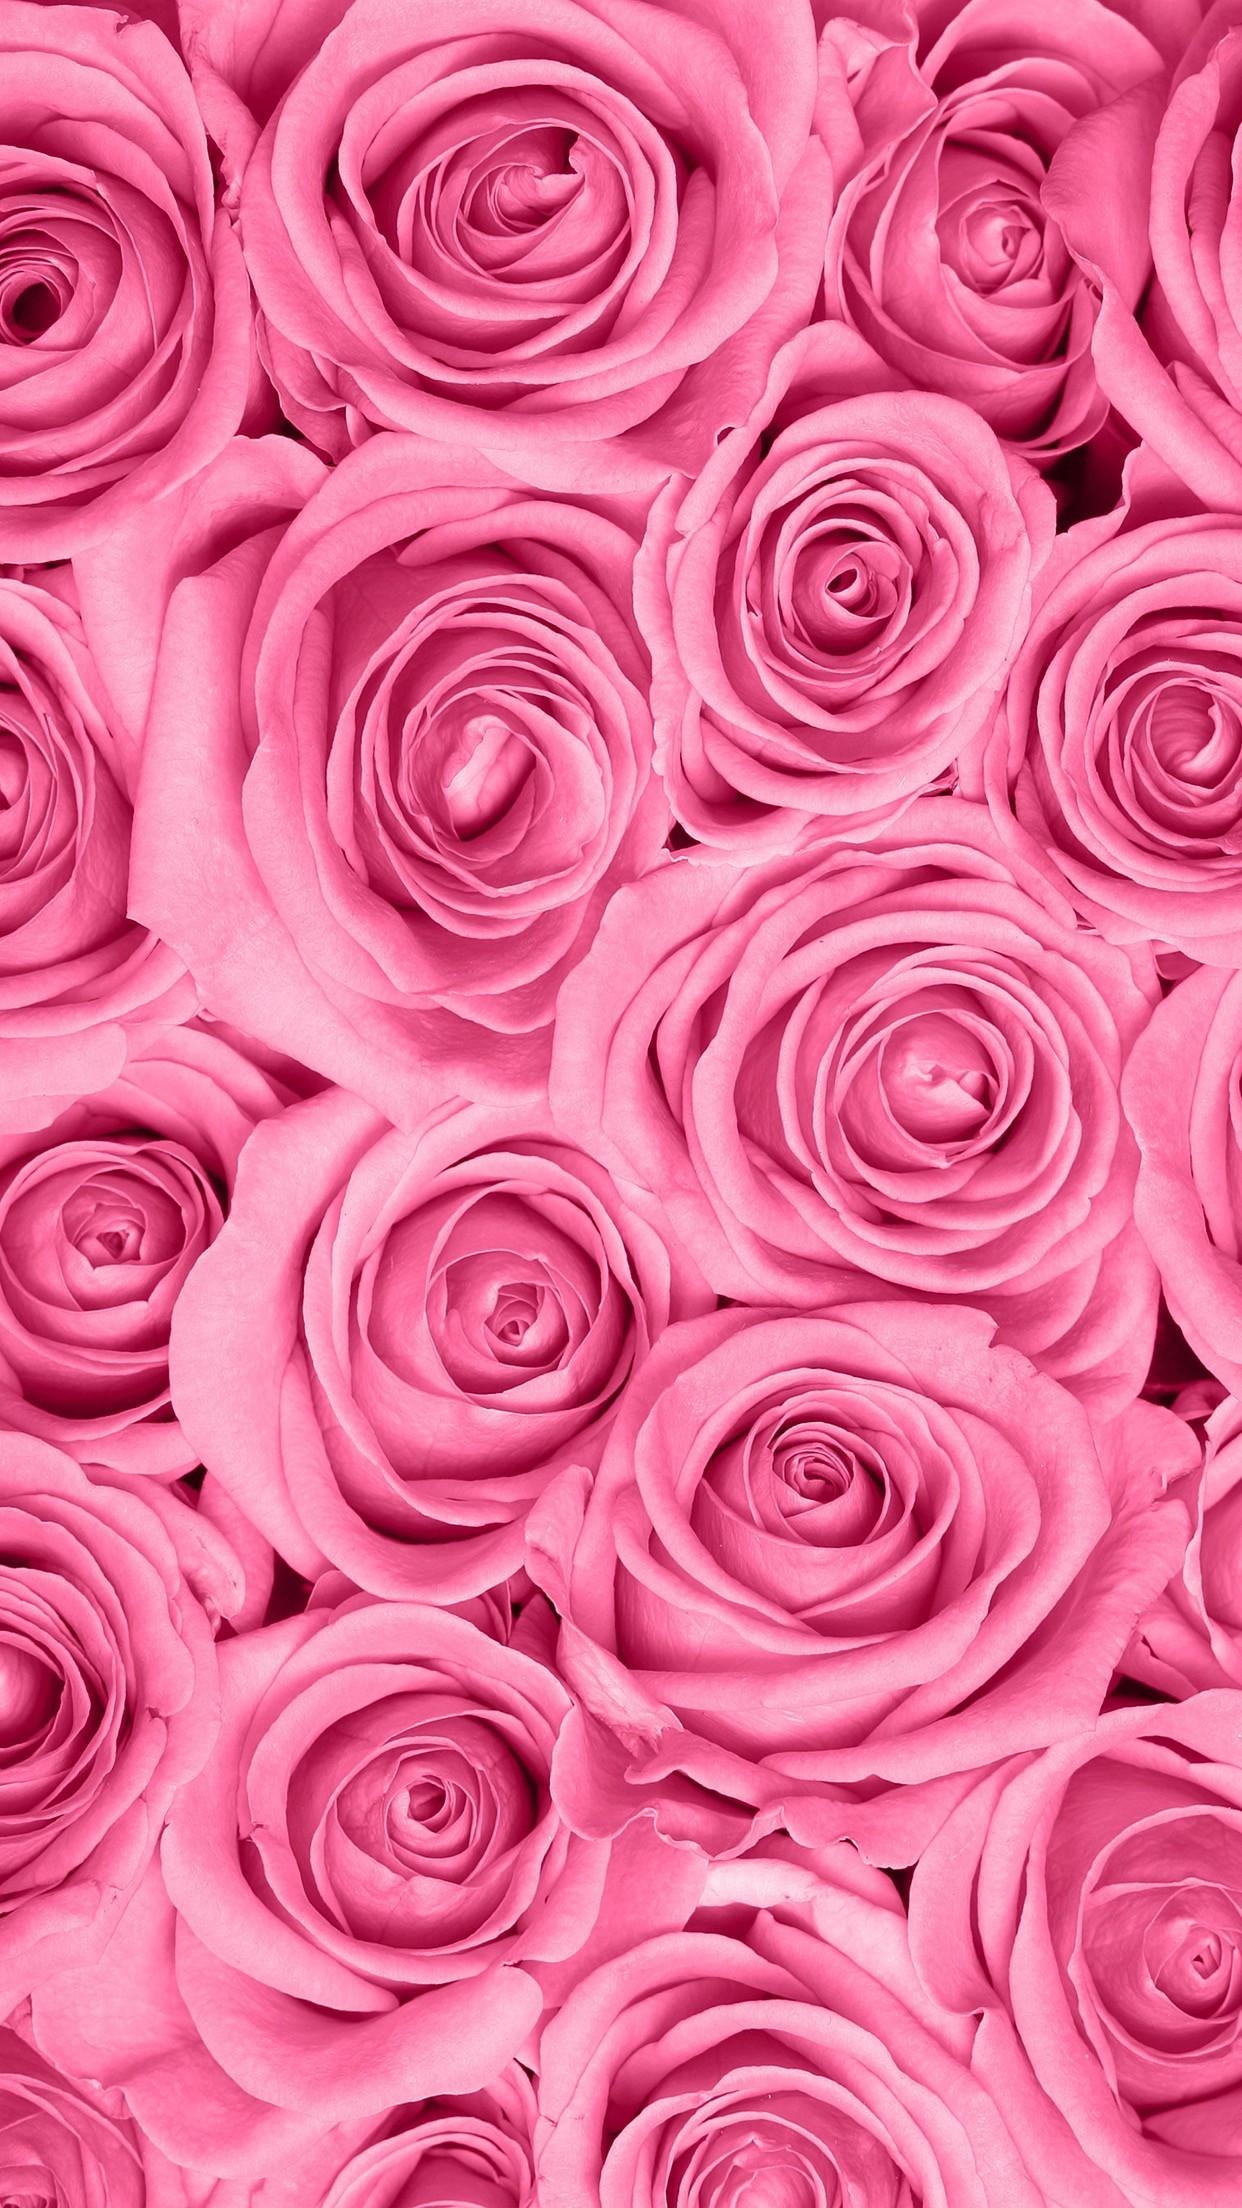 Spring Wallpaper, Rose Wallpaper, Mobile Wallpaper, - Pink Roses Wallpaper Phone - HD Wallpaper